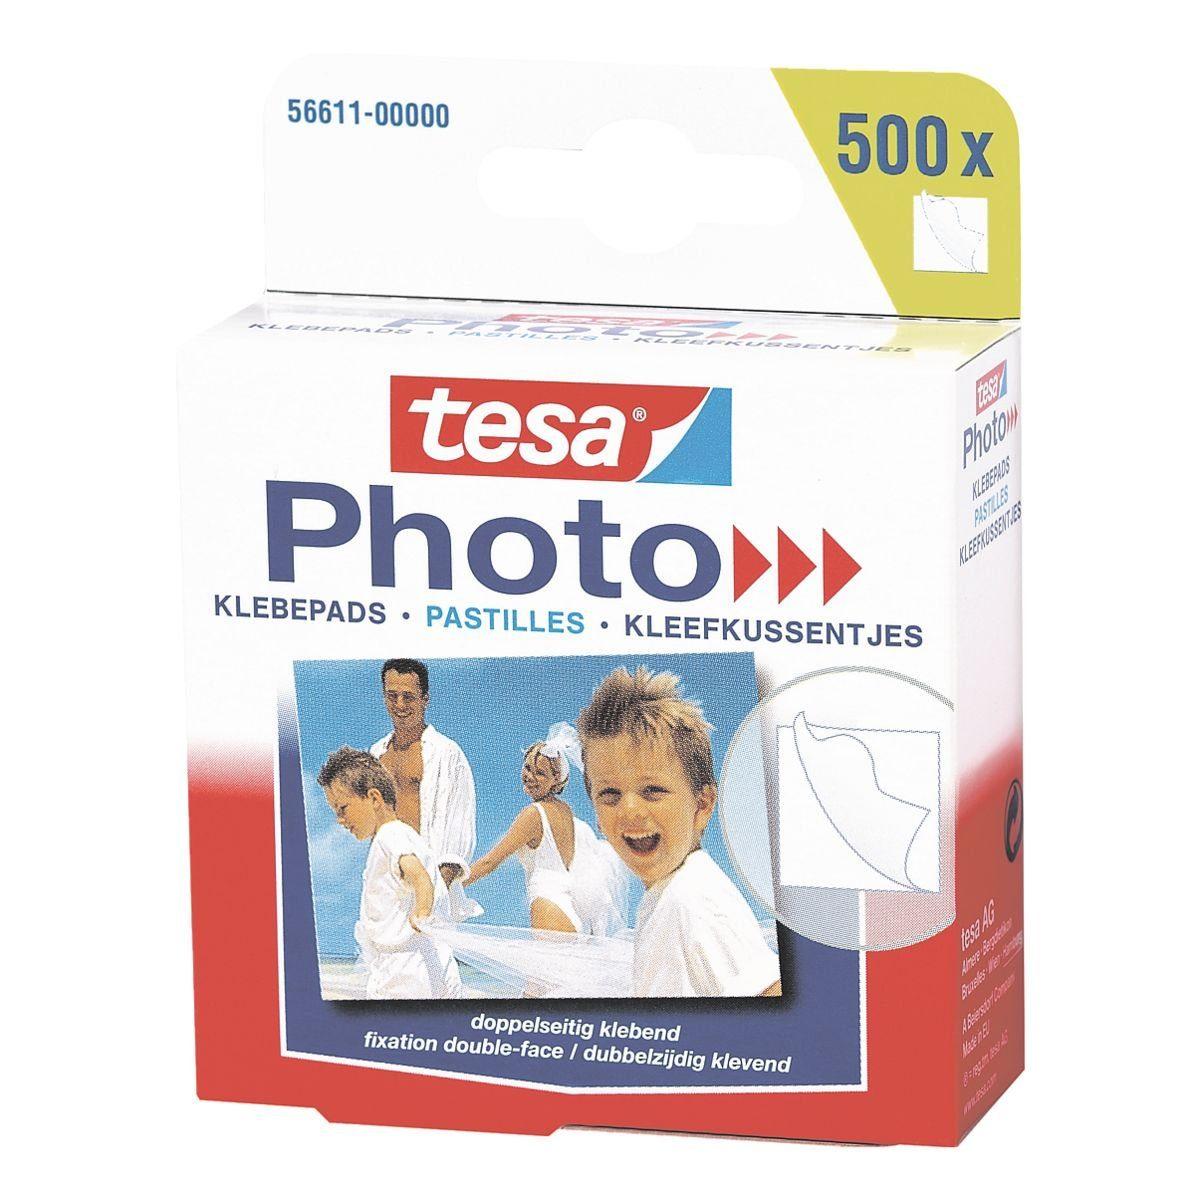 Tesa Doppelseitige Klebepads »Photo«